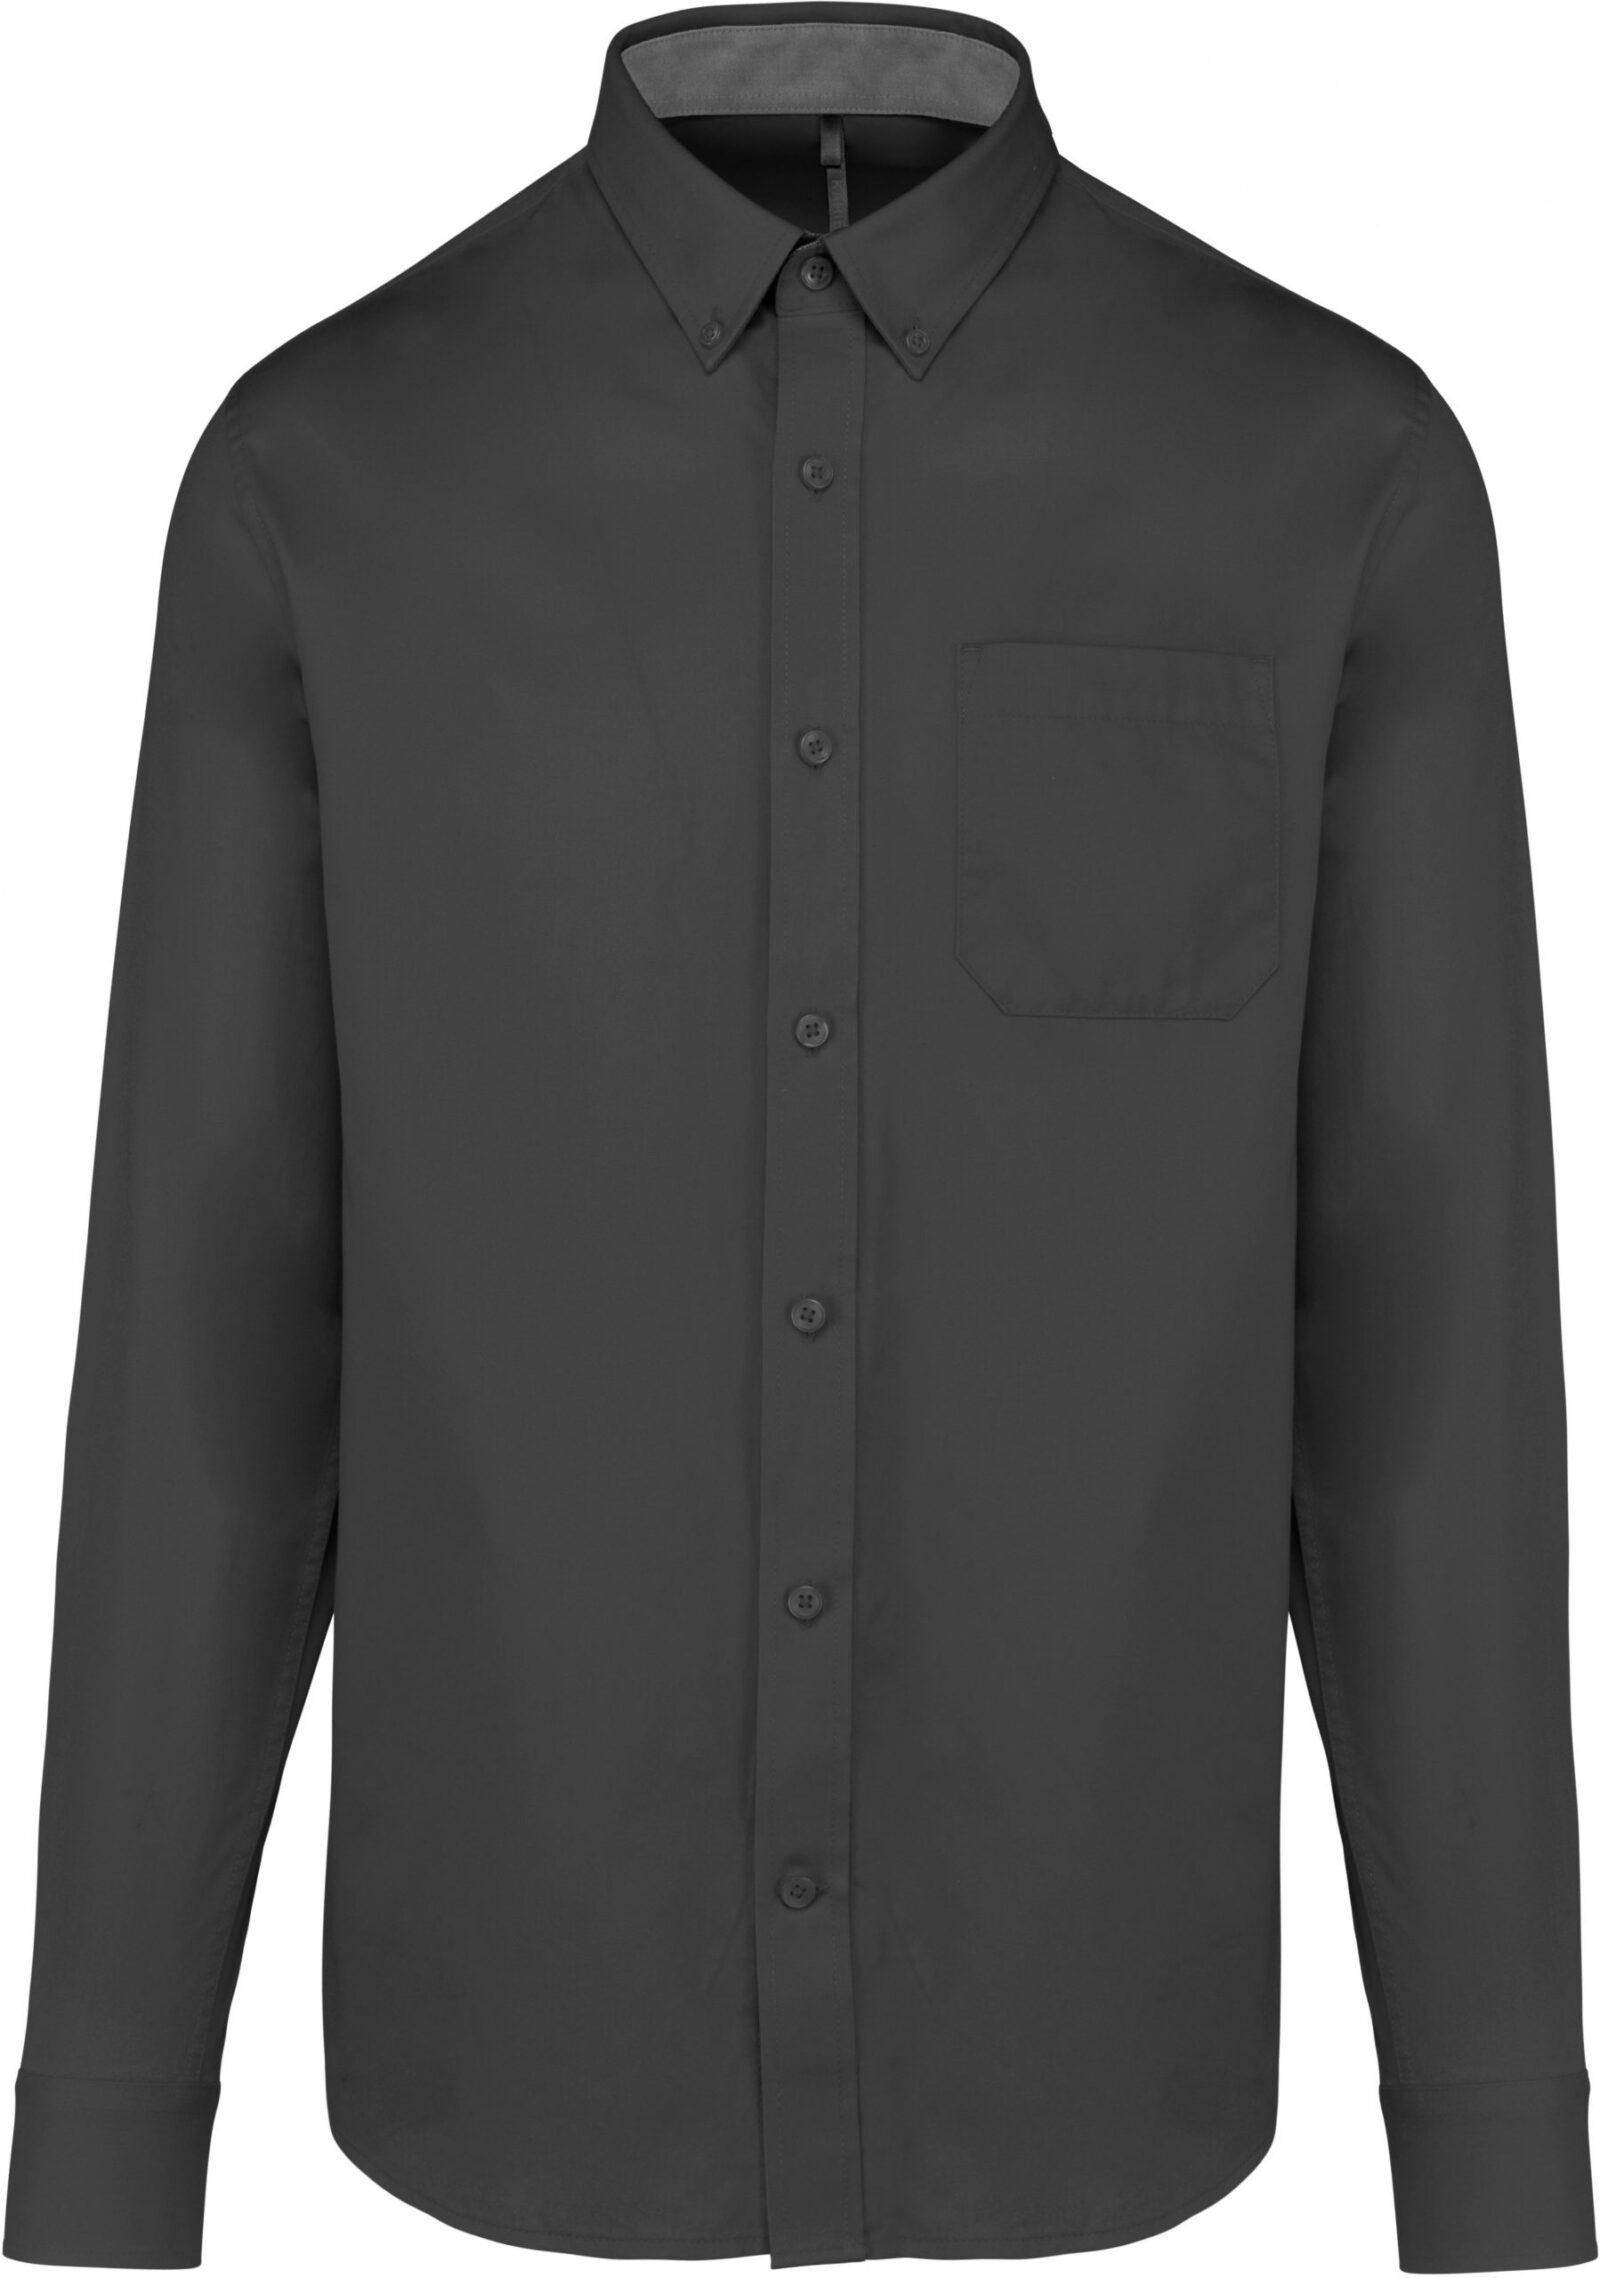 Camasa Nevada KA586 dark grey Camasi dama barbatesti corporate bar maneca scurta maneca lunga broderie serigrafie termotransfer| Toroadv.ro